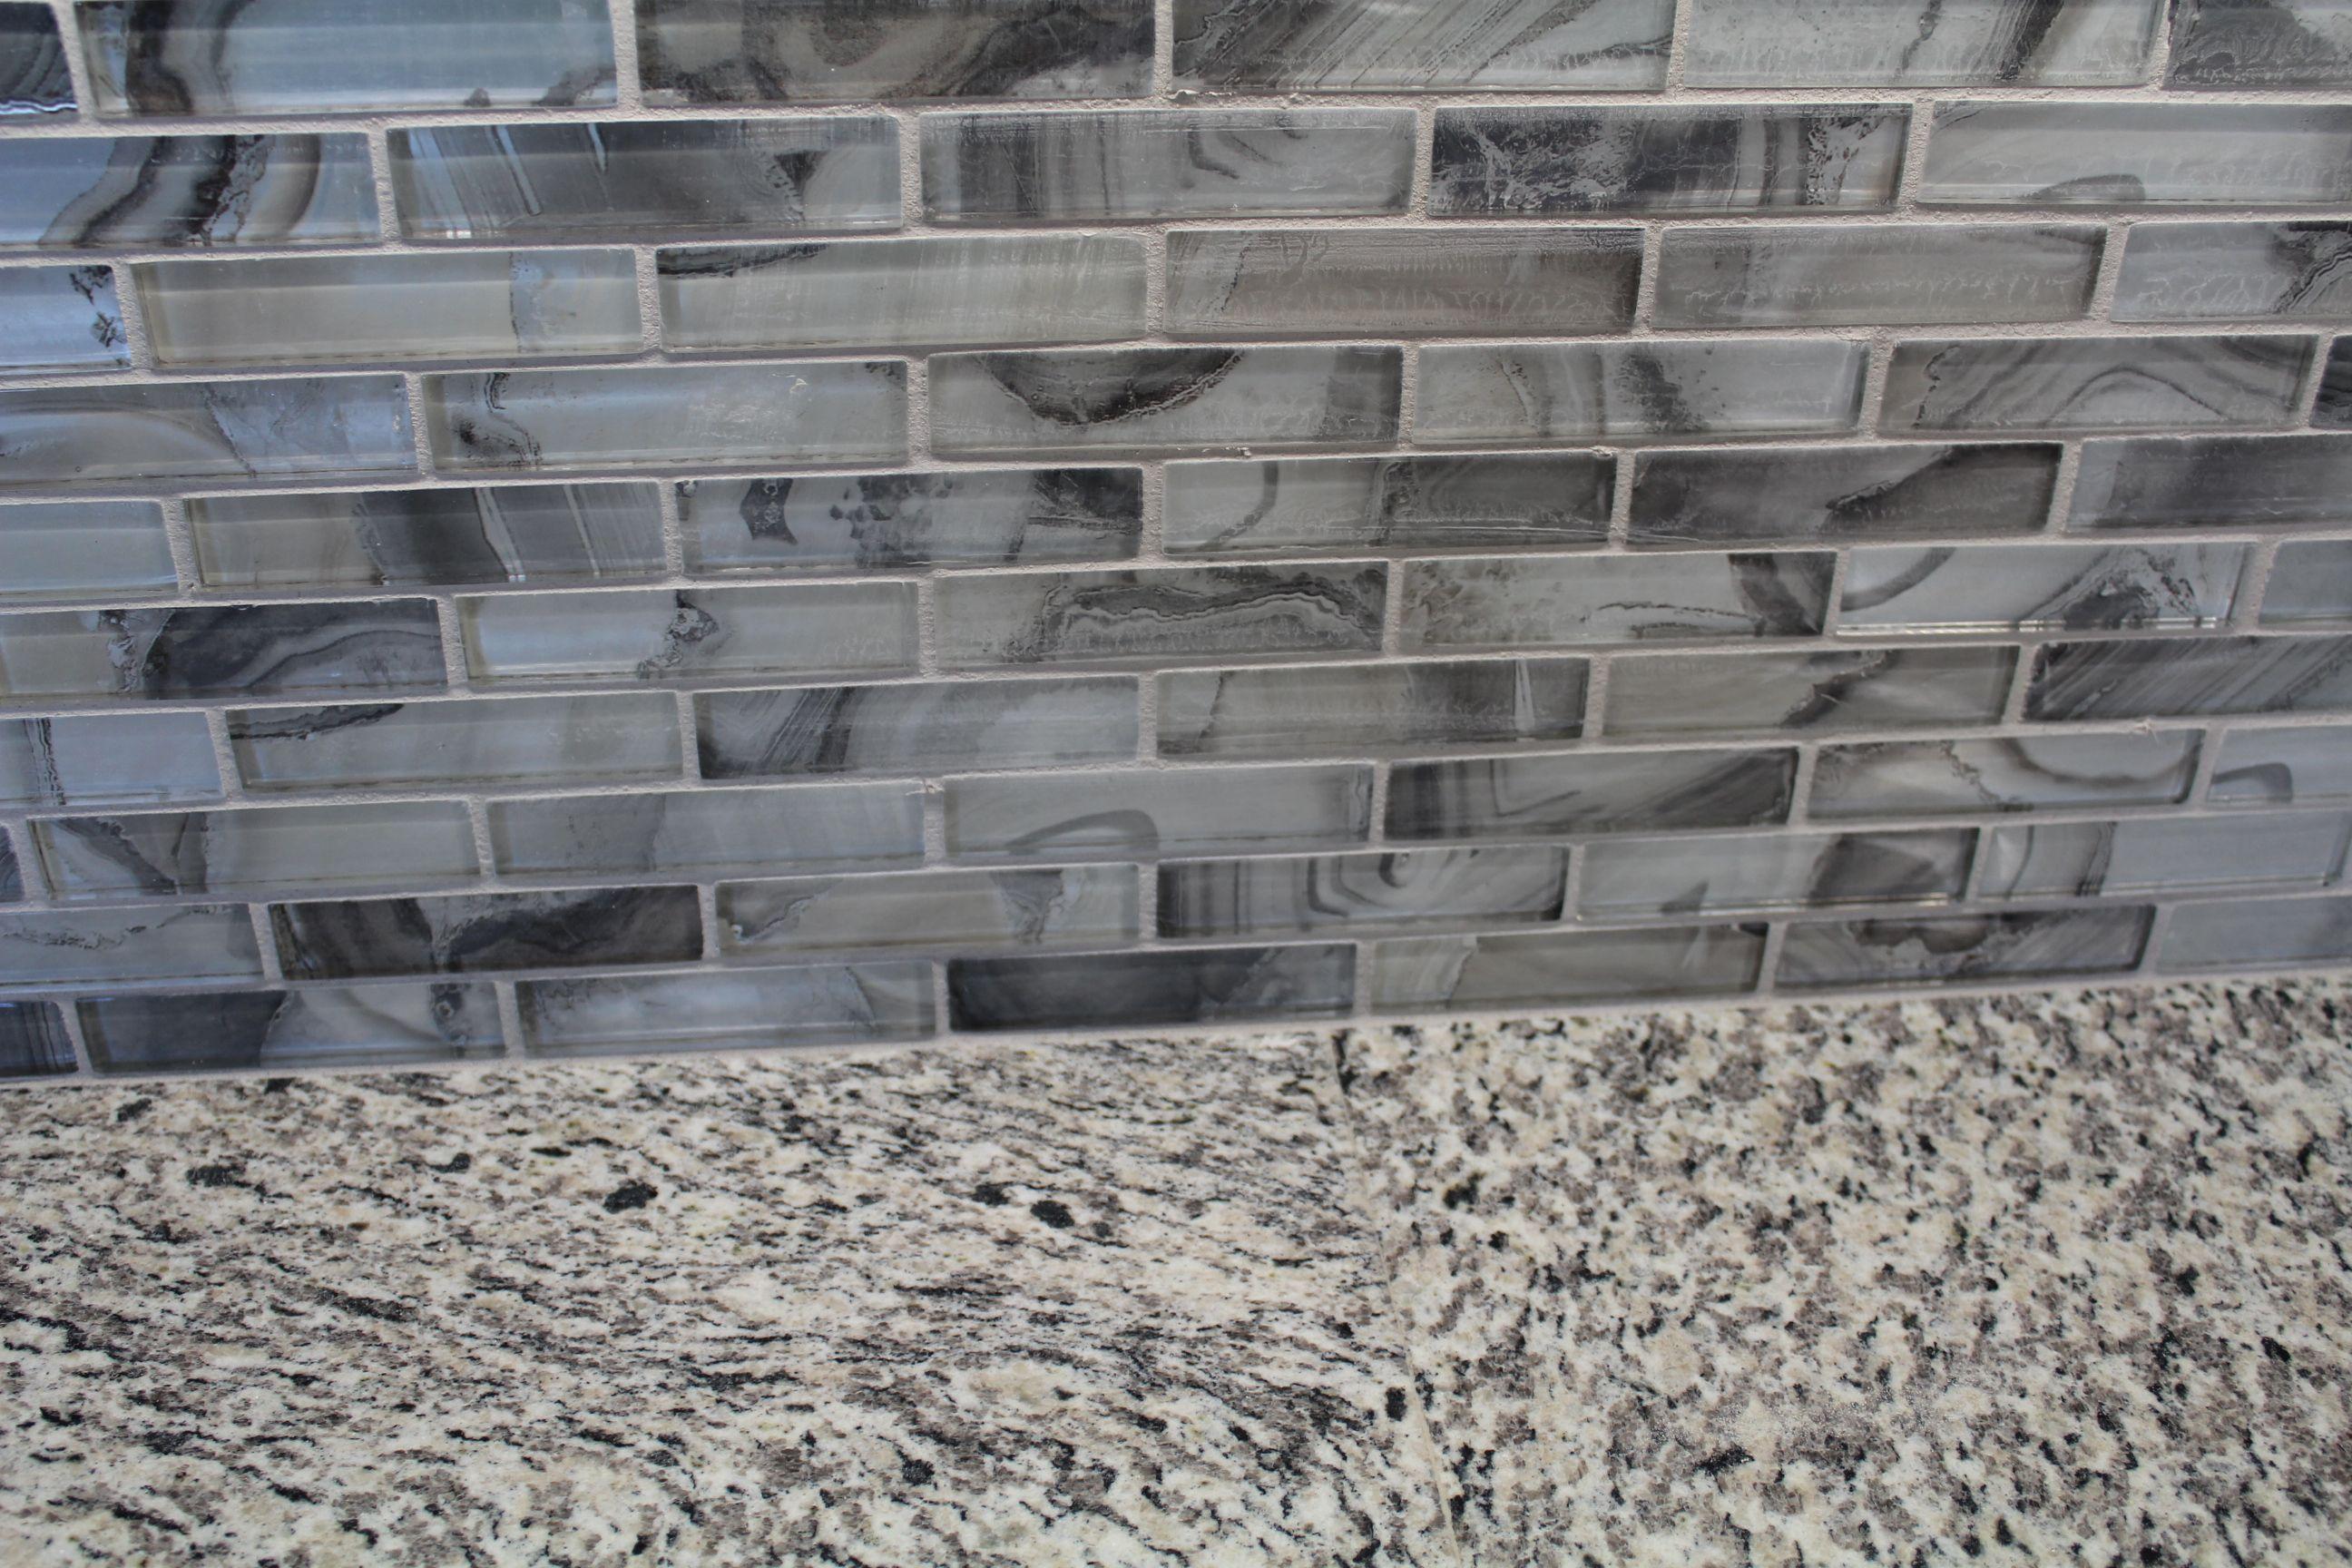 Granite Color Cameo Backsplash Accent Tile Gypsea Triton 1x4 Blues And Grays For A Kitchen